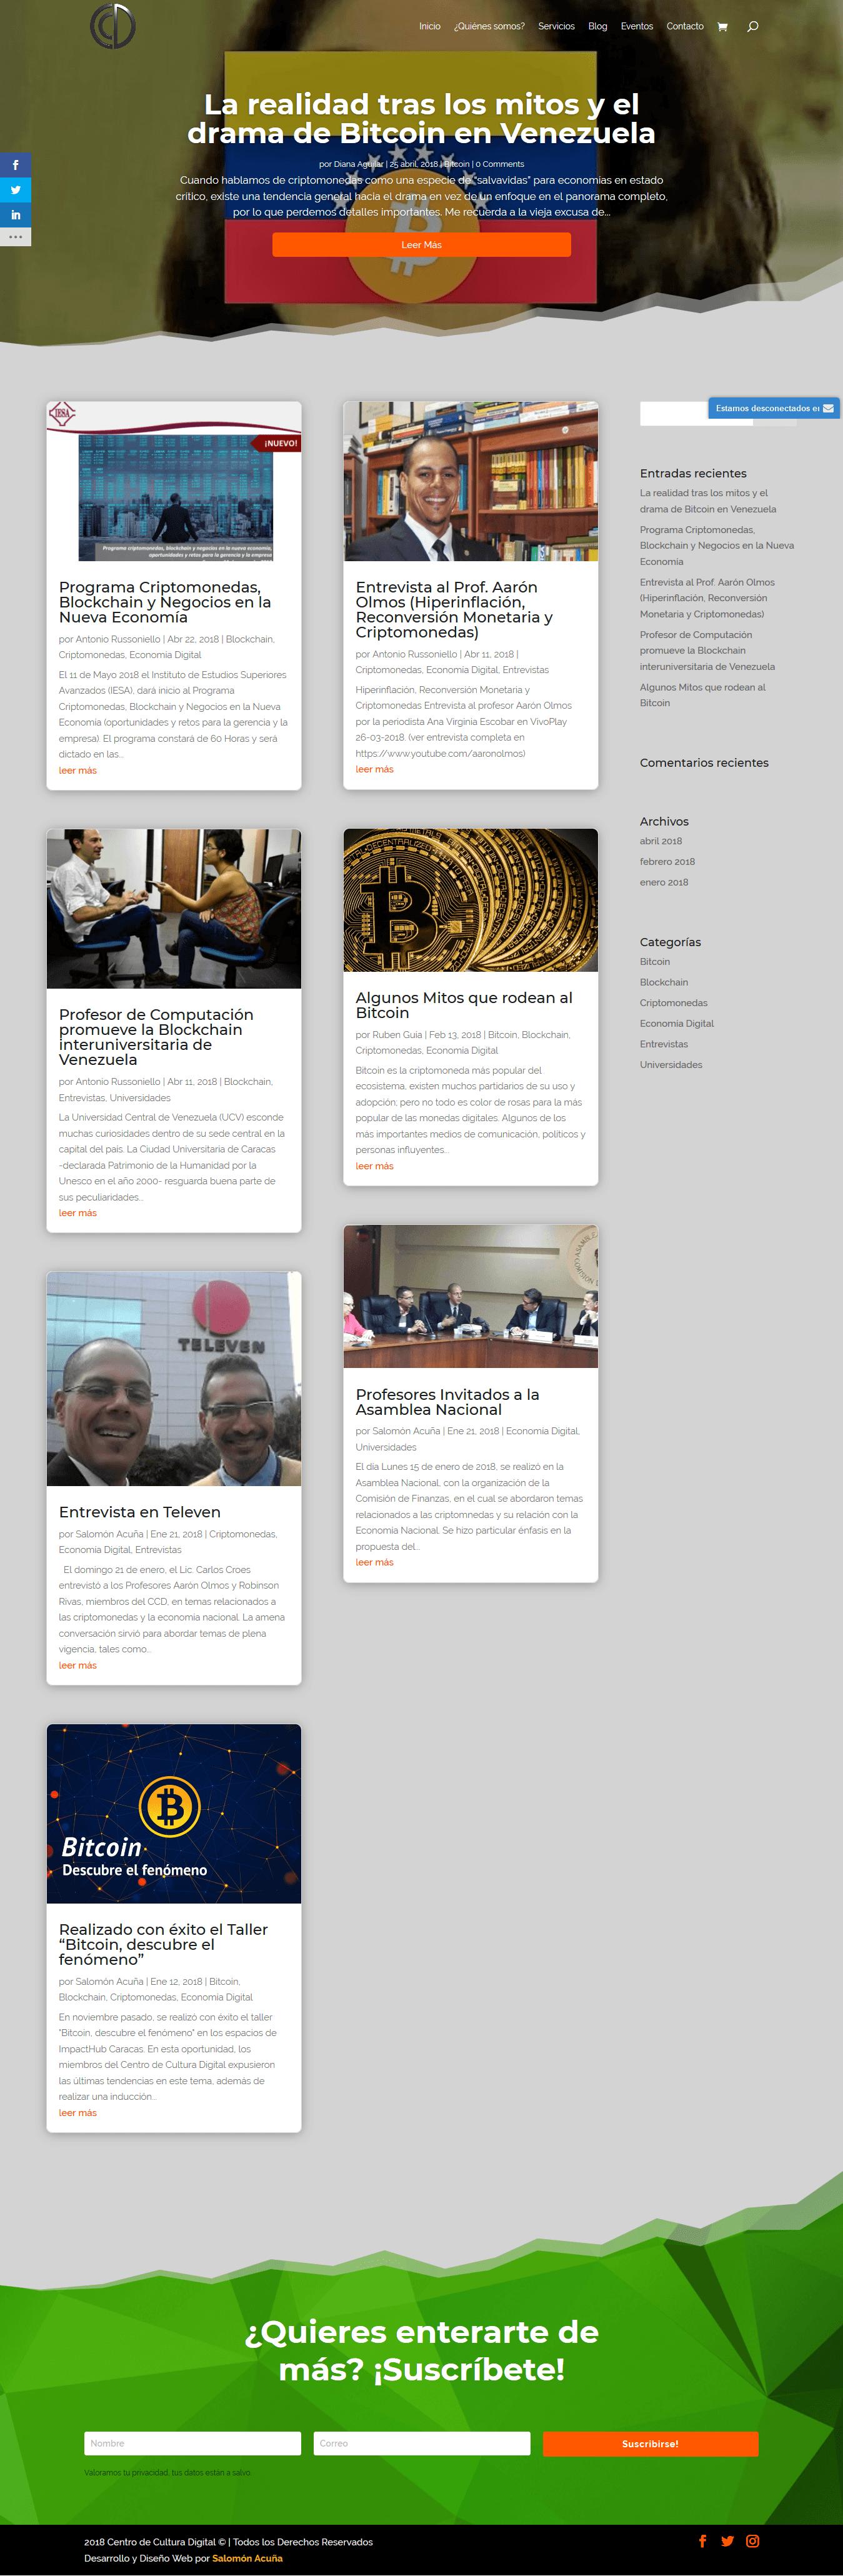 Blog Centro de Cultura Digital